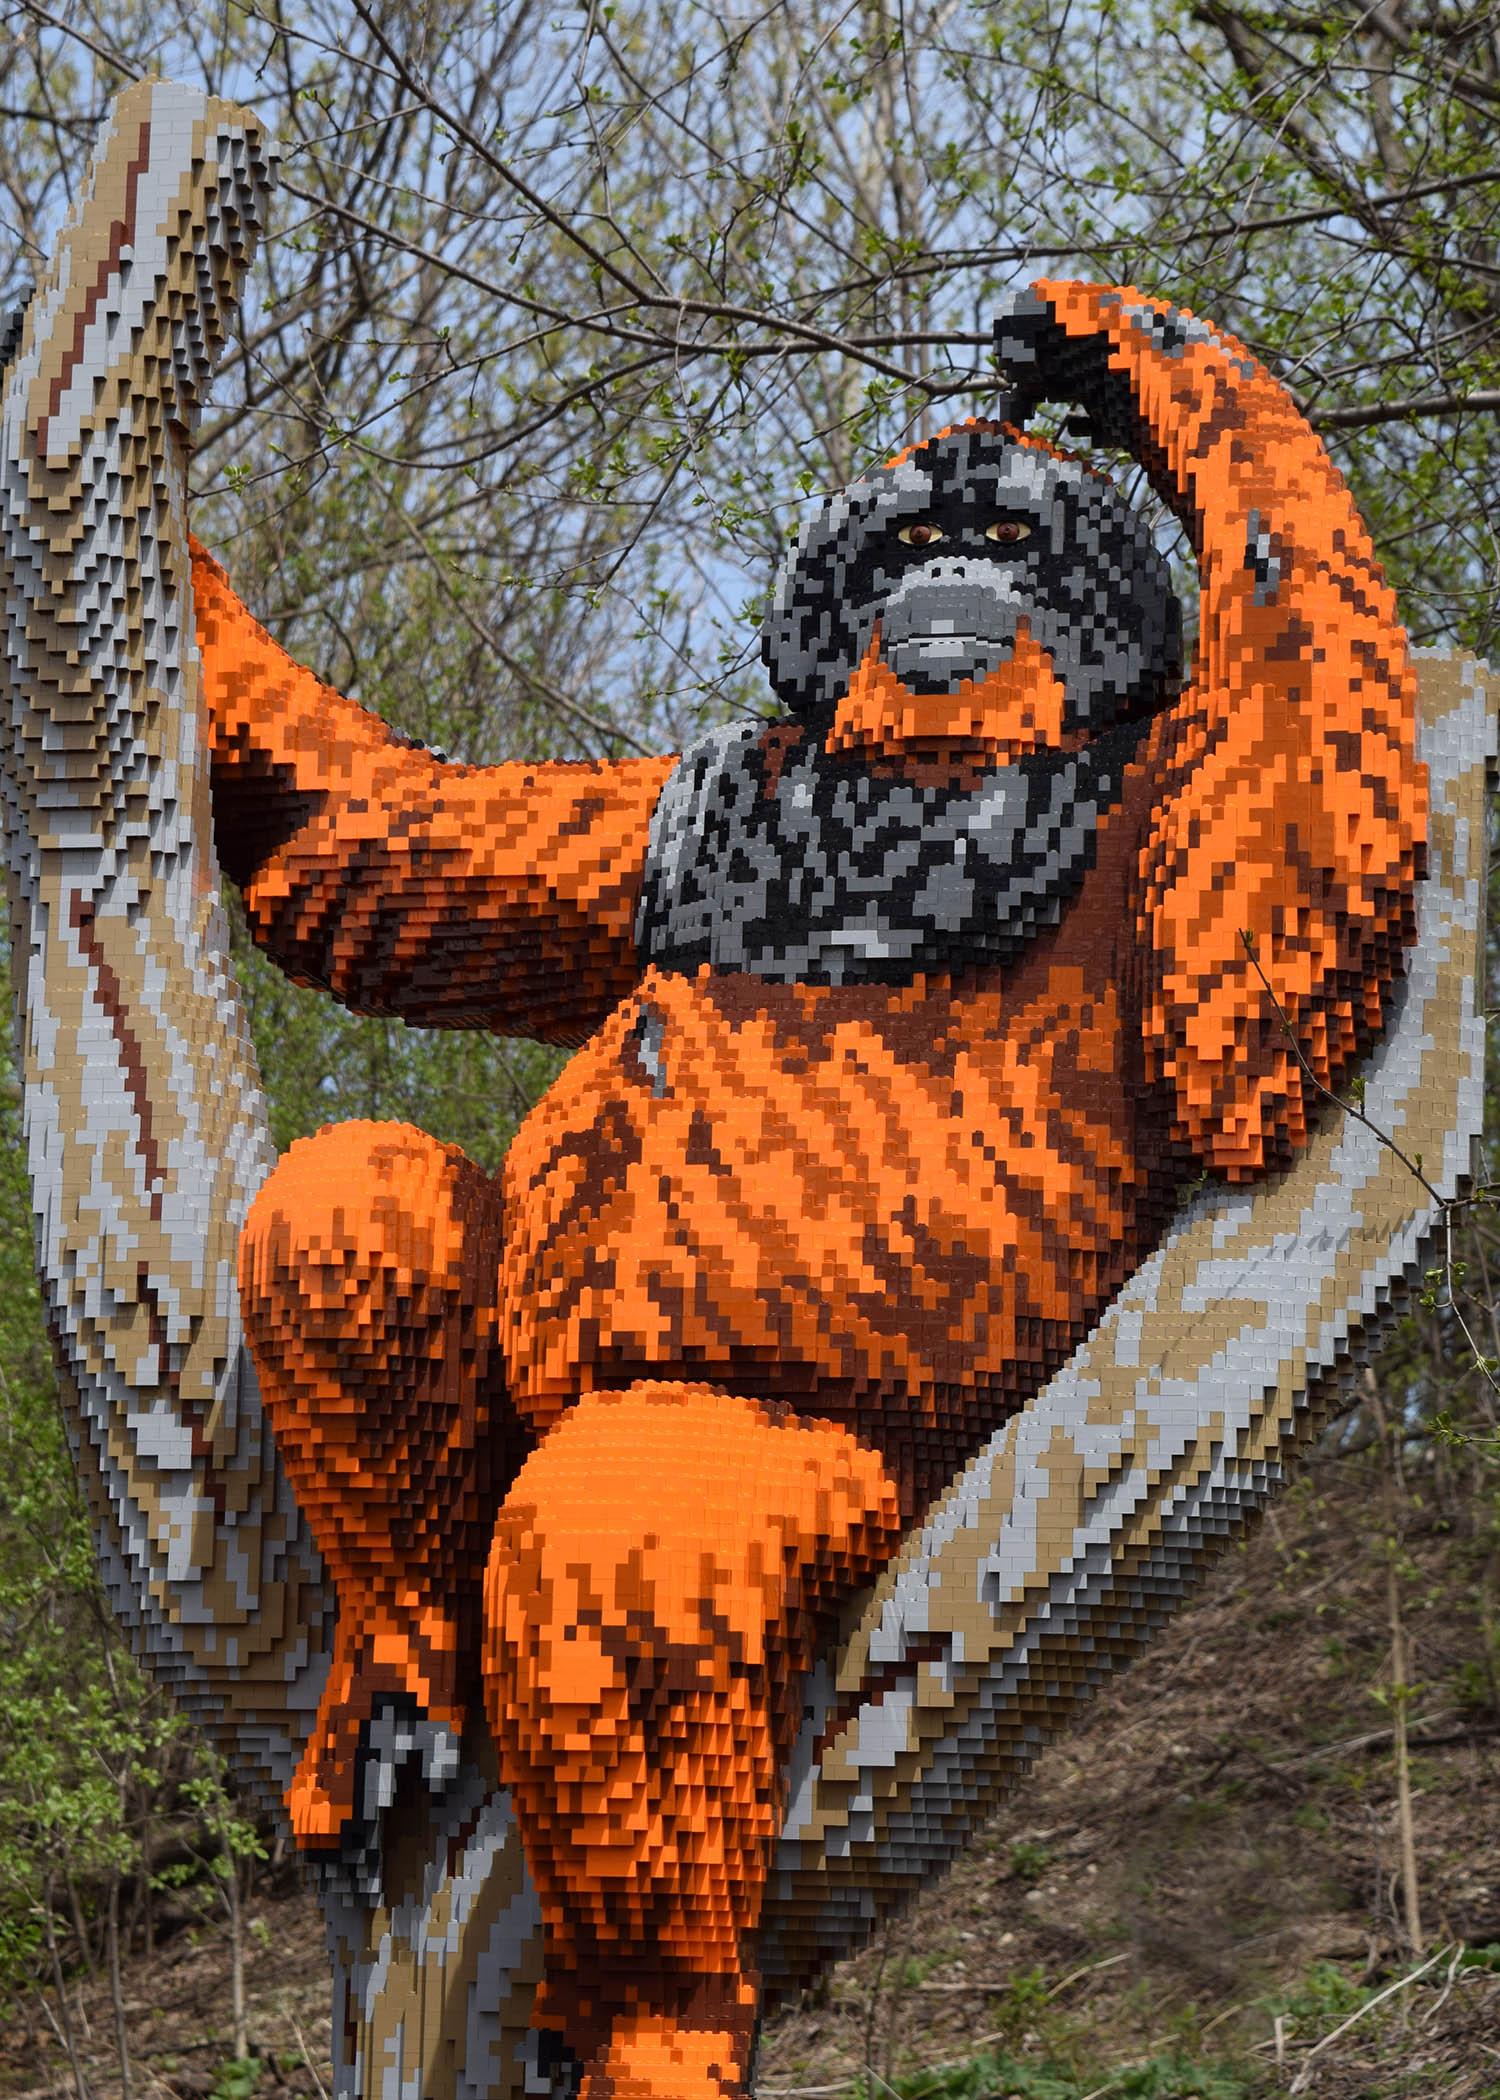 Brick-Safari-Orangutan.jpg